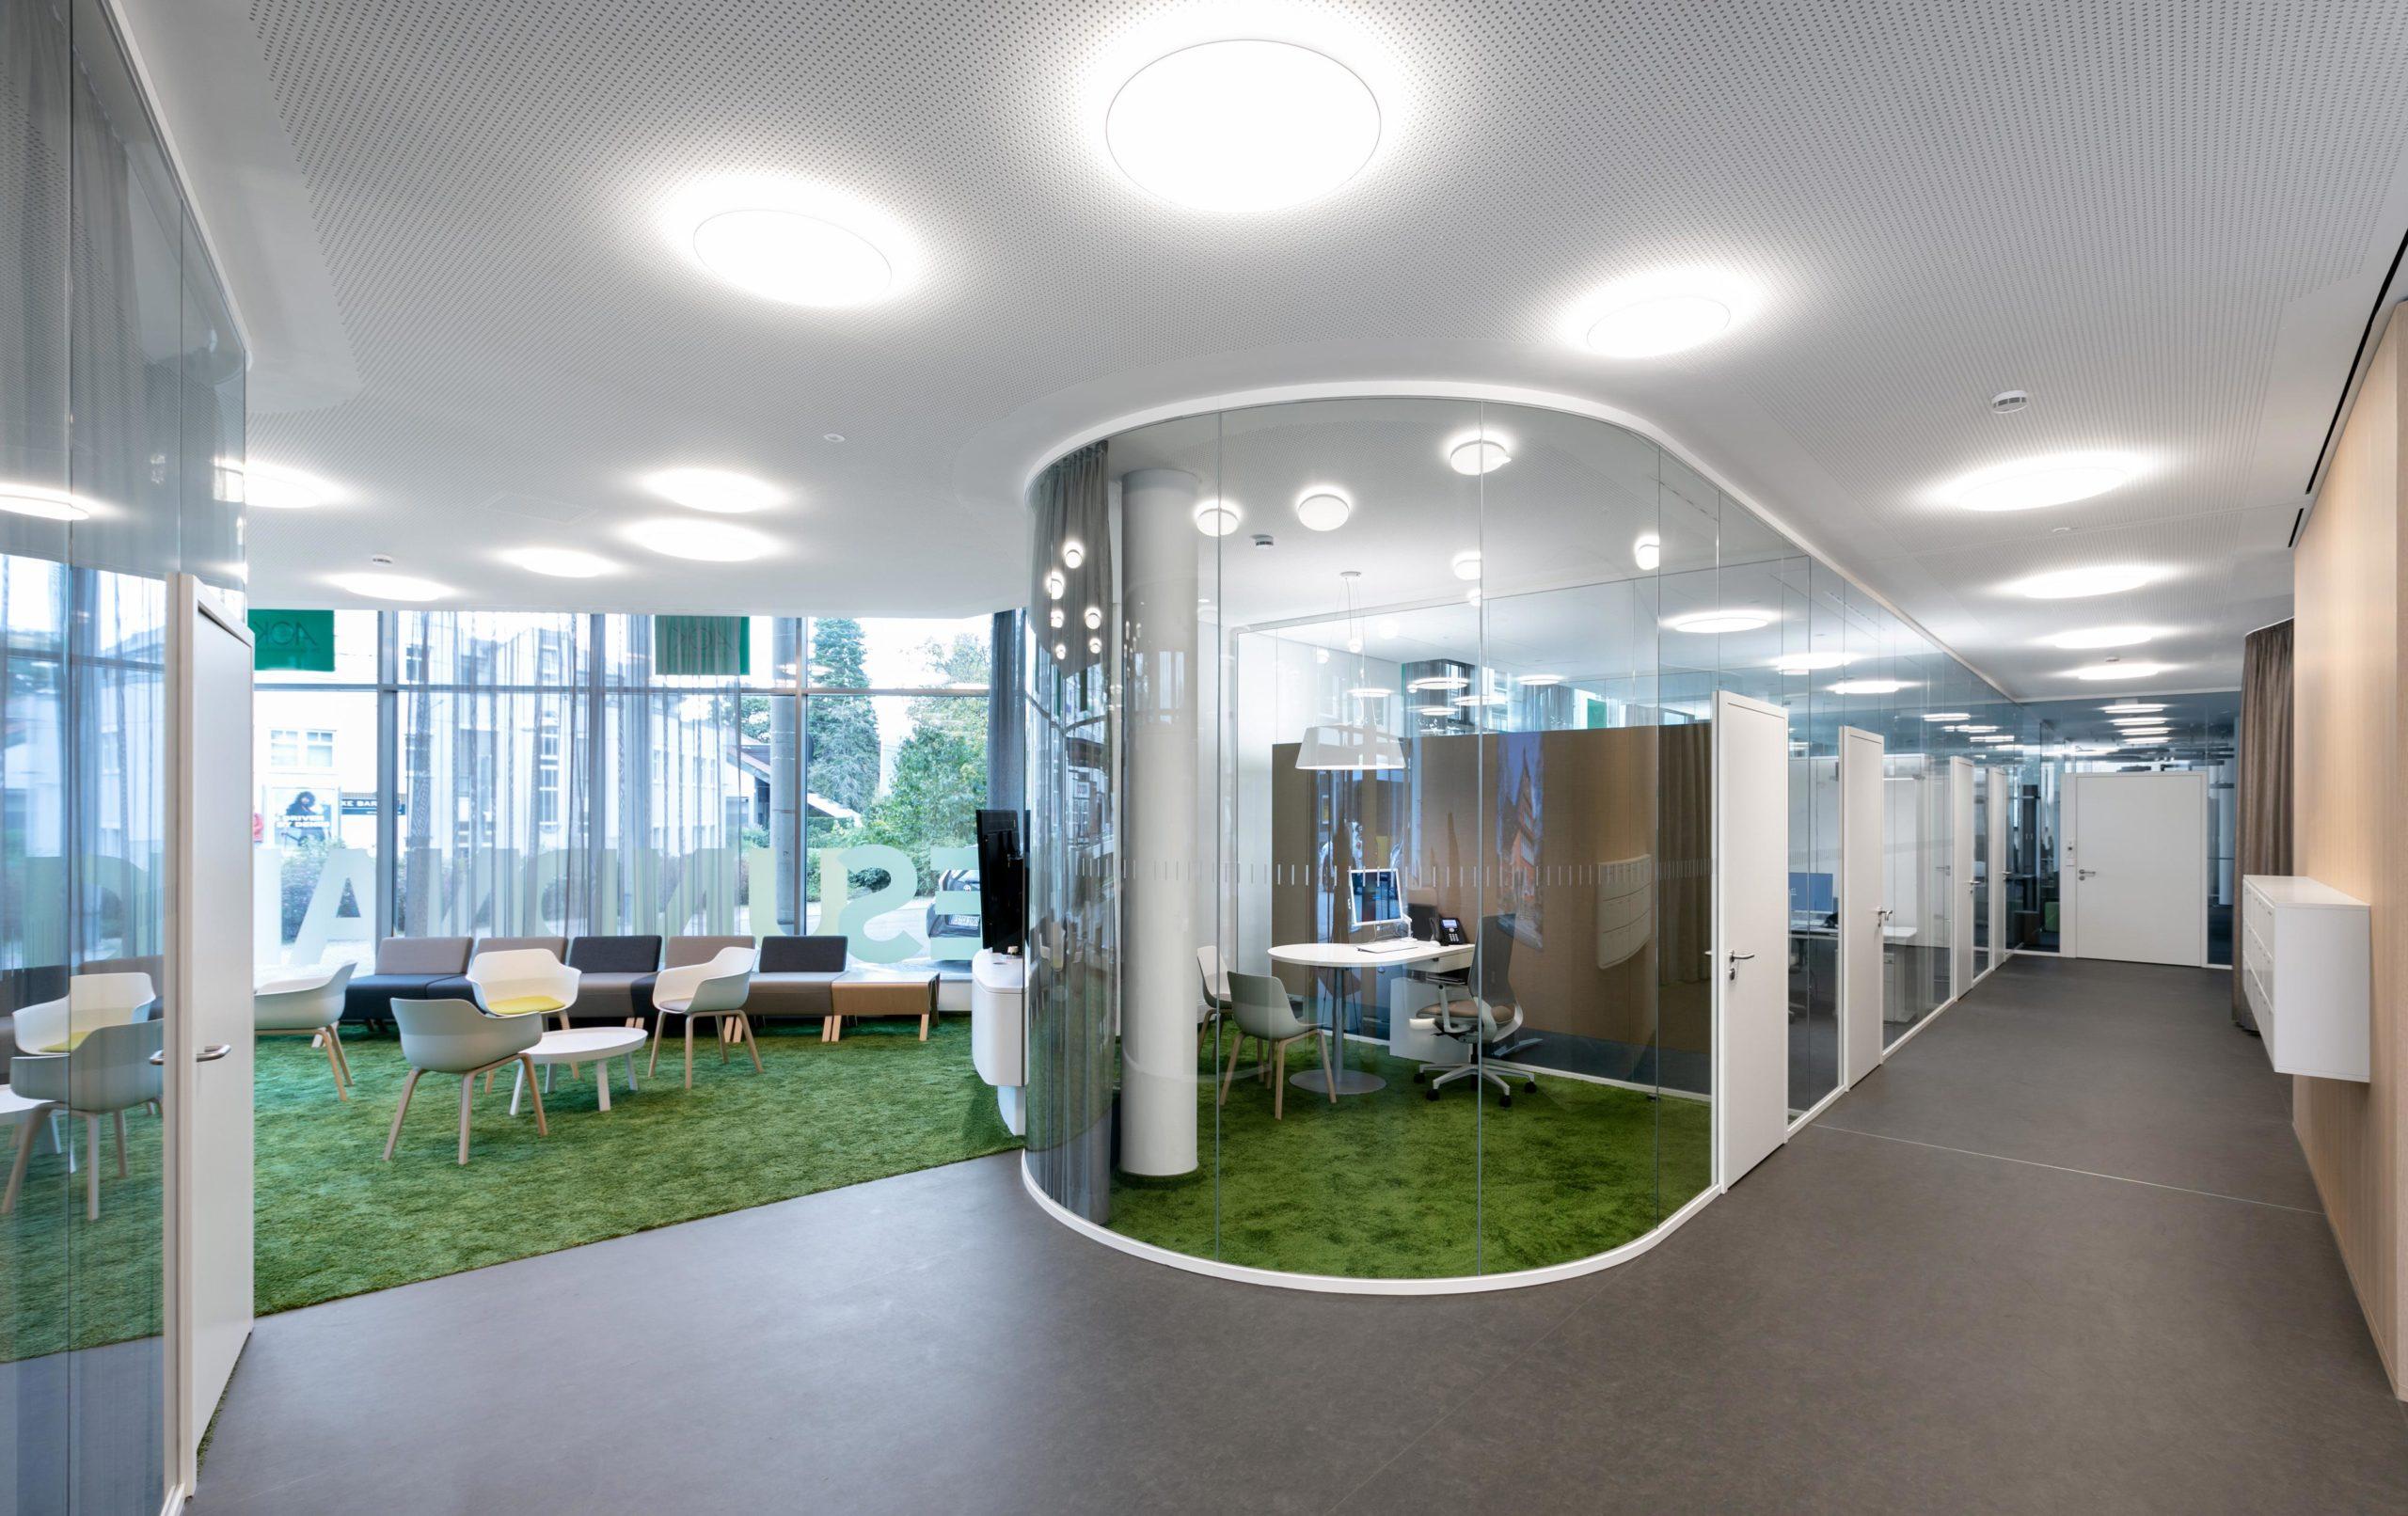 AOK Kundencenter Stuttgart-Vaihingen